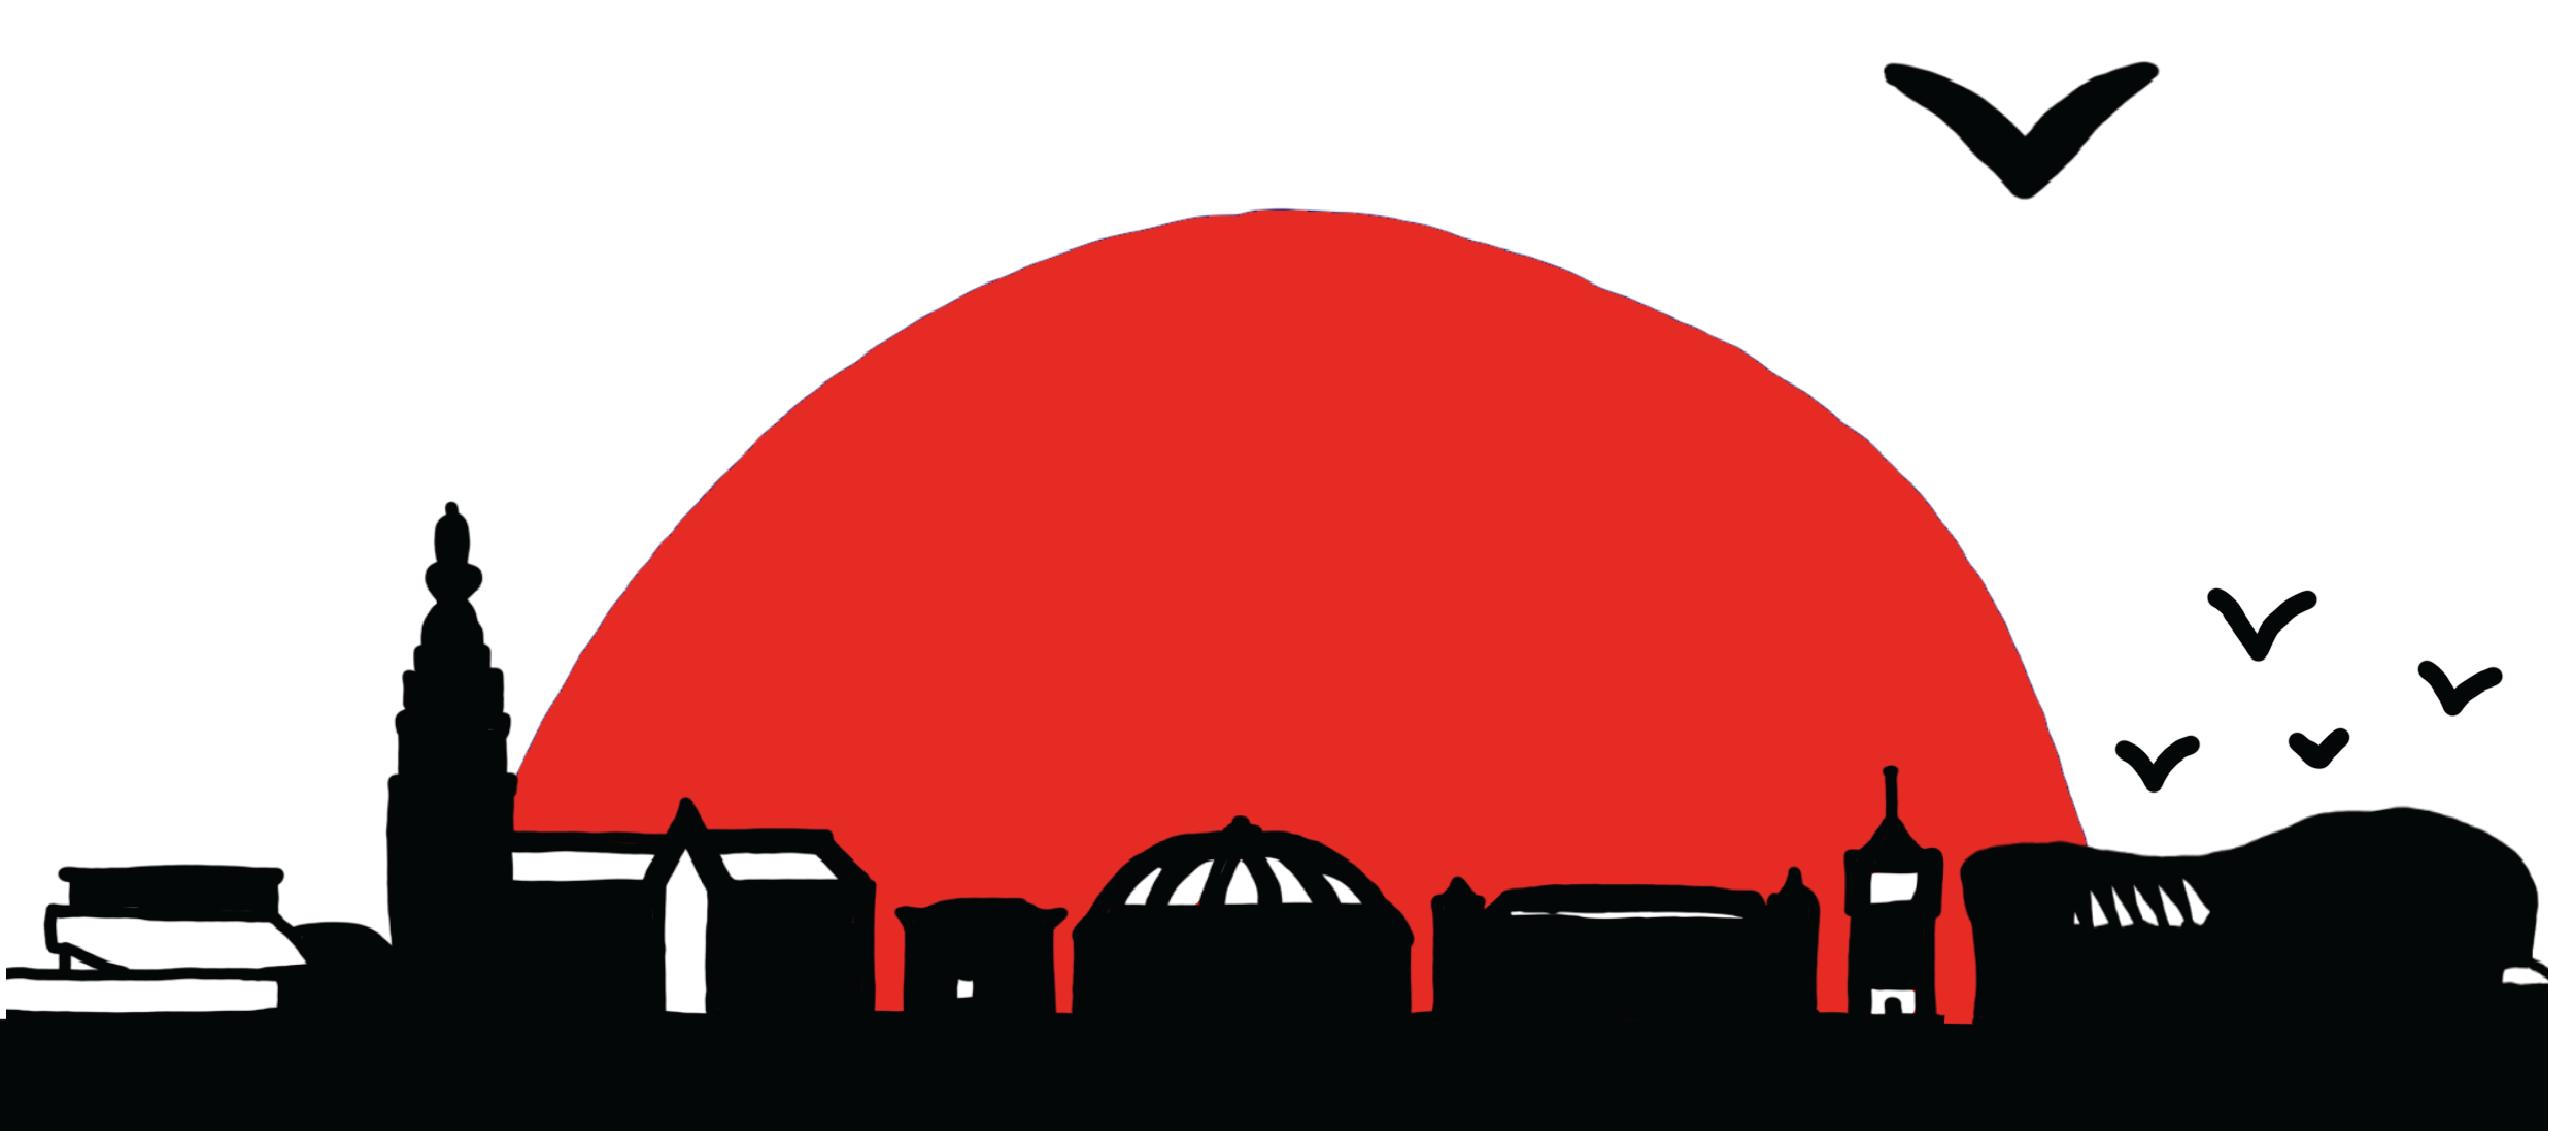 revealing new horizons logo TedxBreda 2021